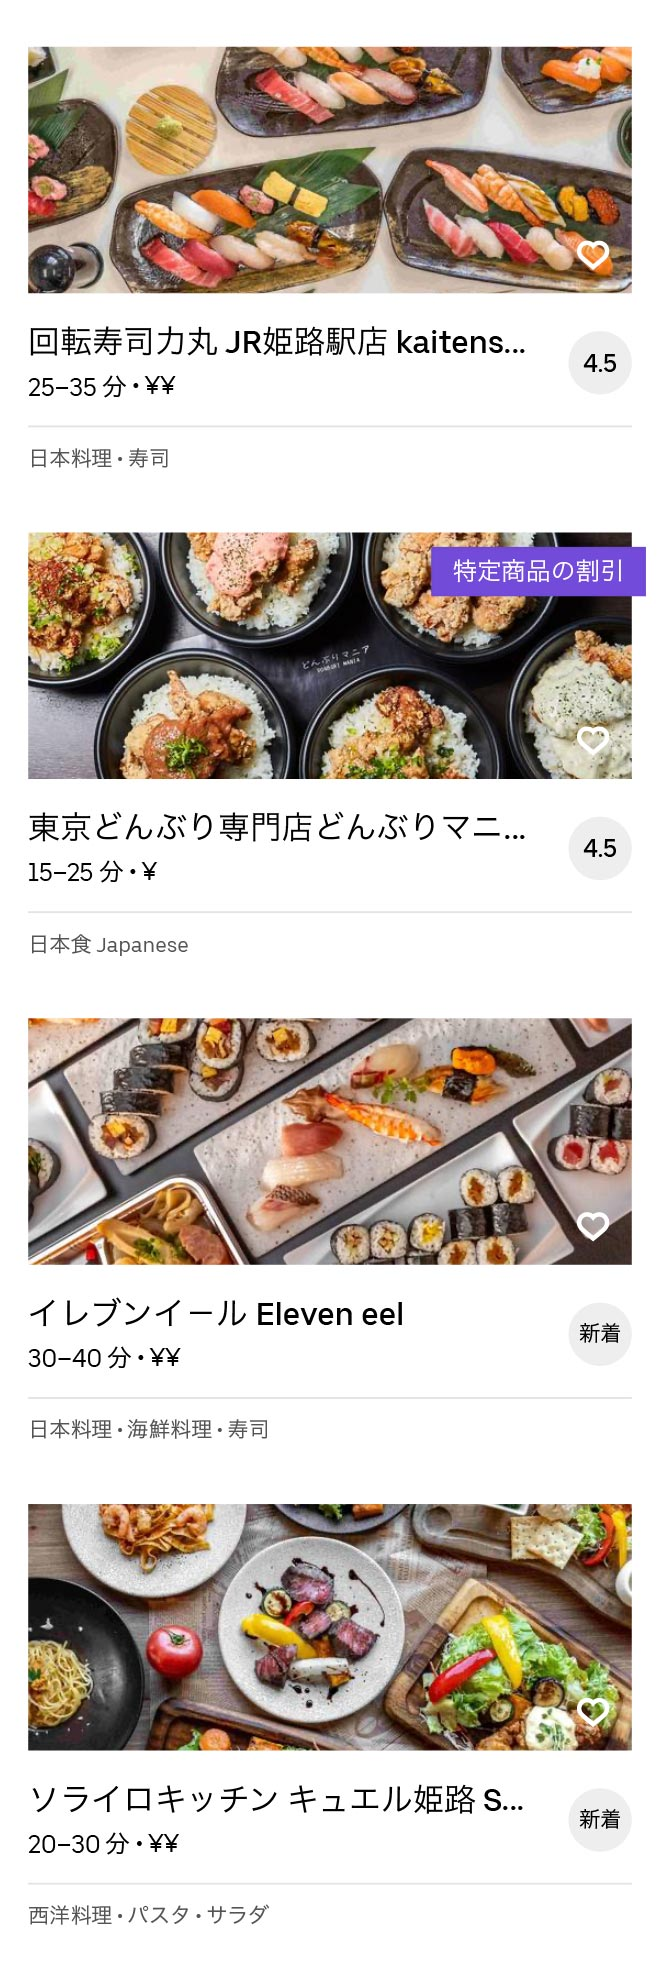 Himeji menu 2007 06